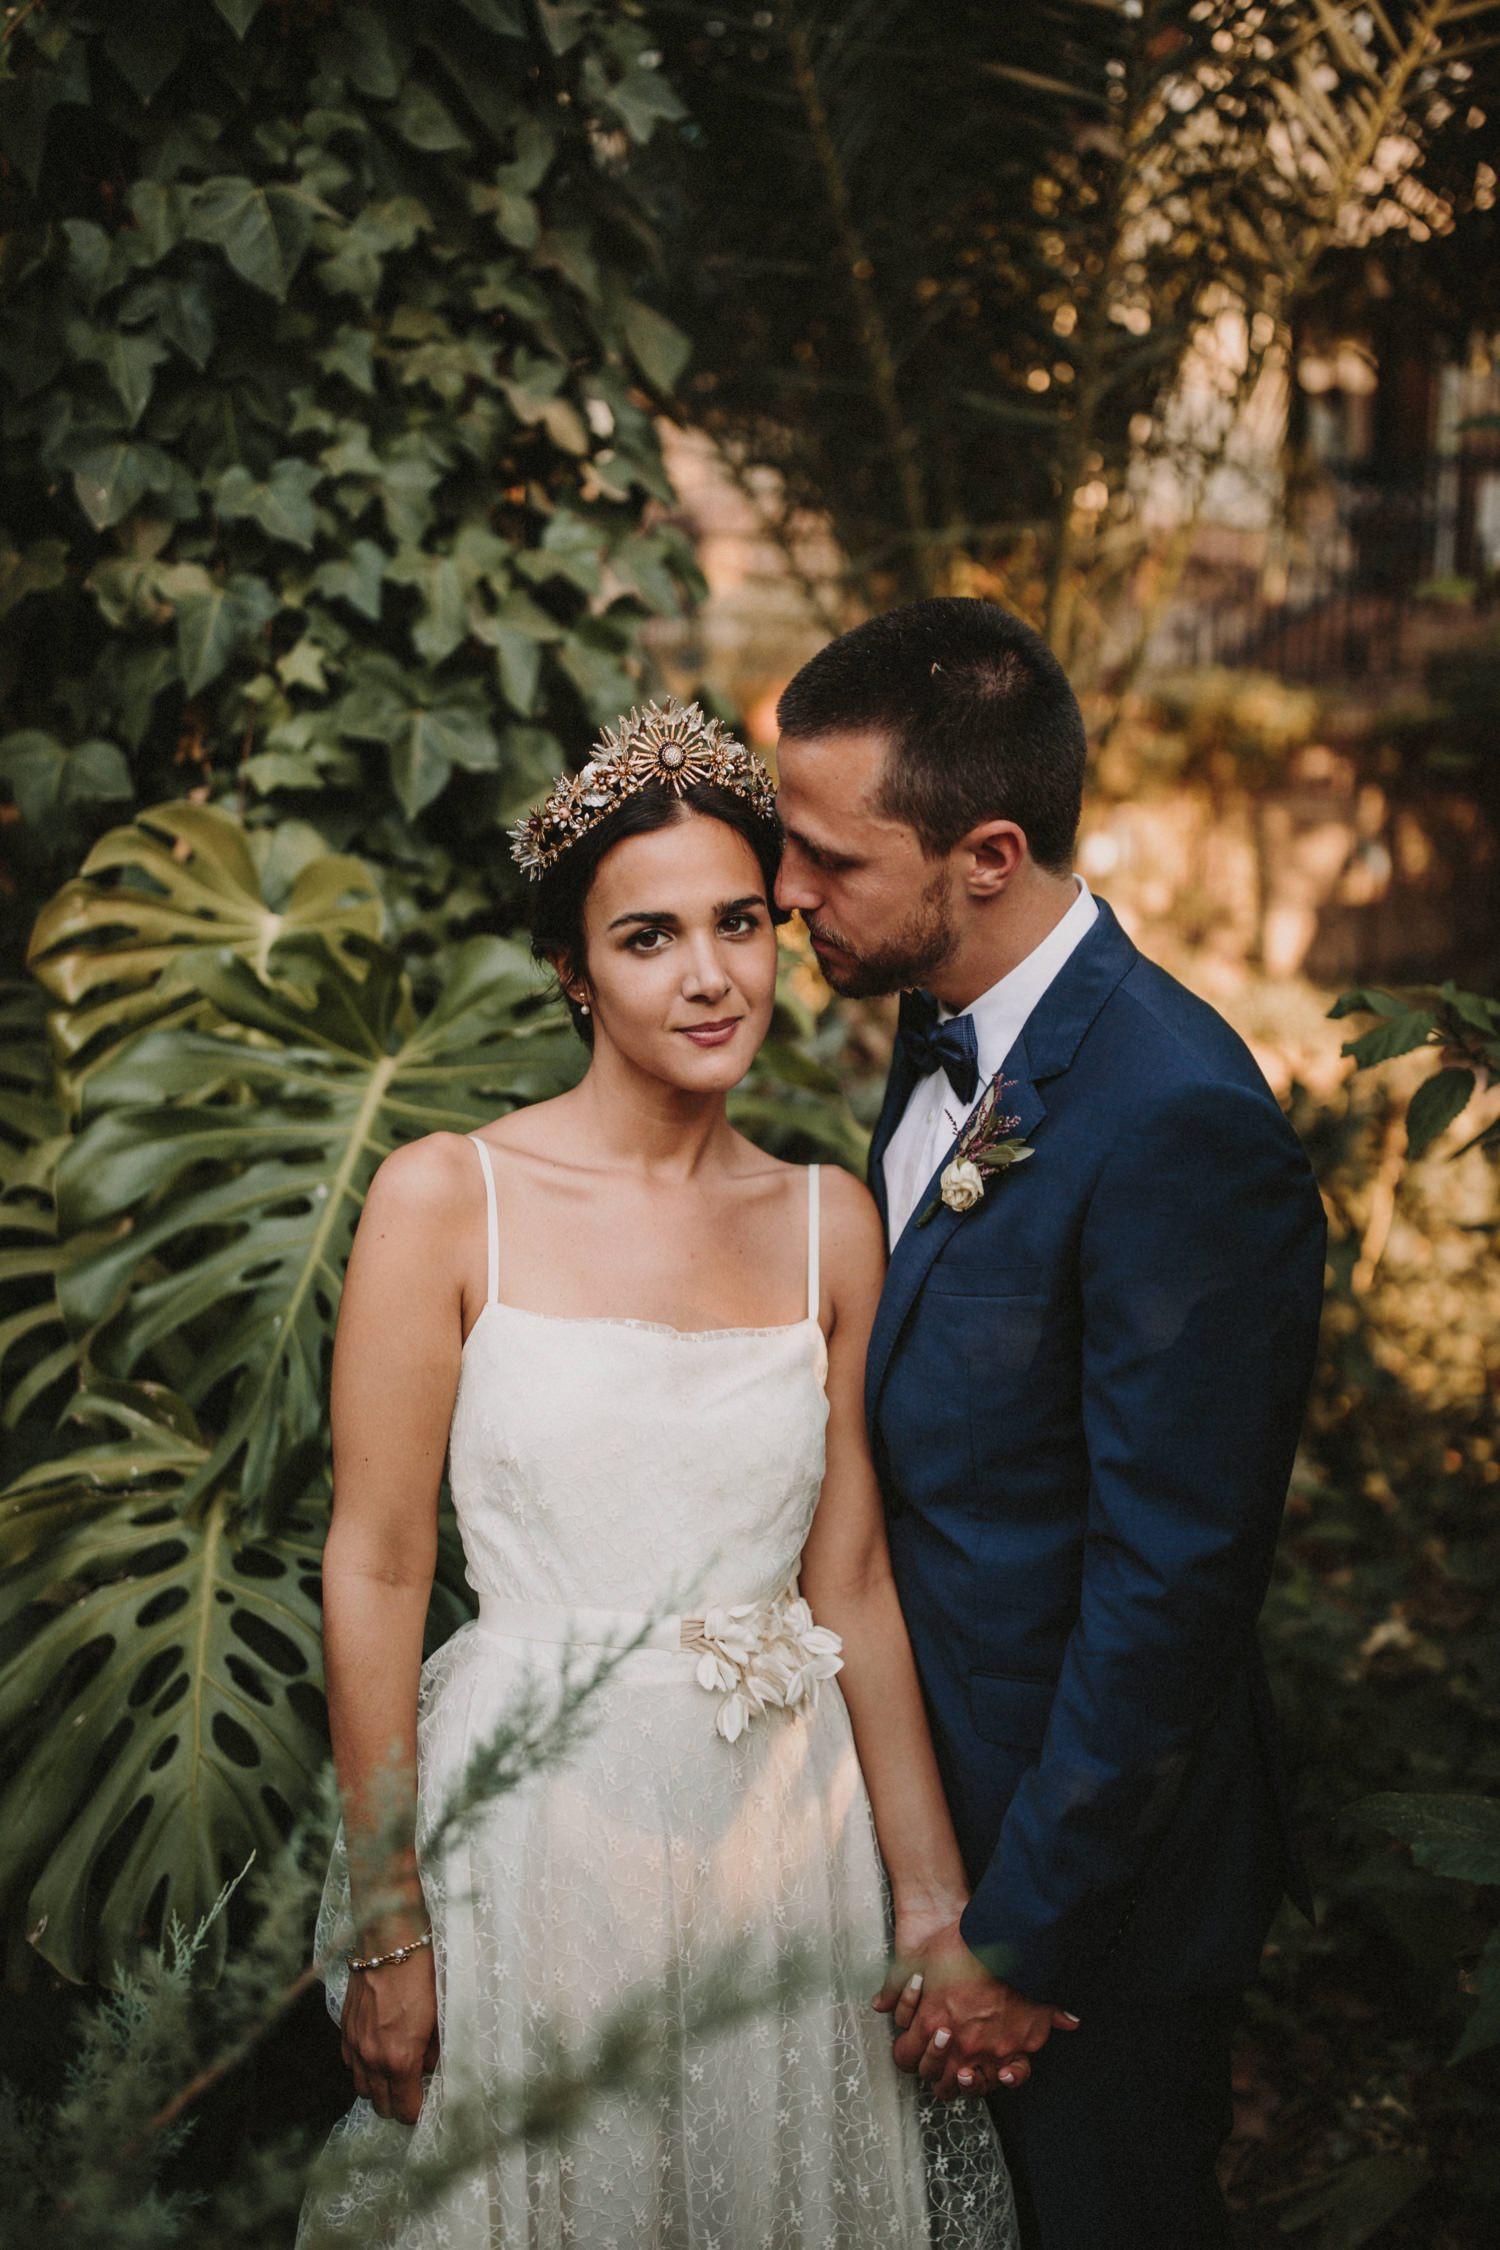 125_wedding-ernestovillalba-maria-daniel-8914-ASE.jpg